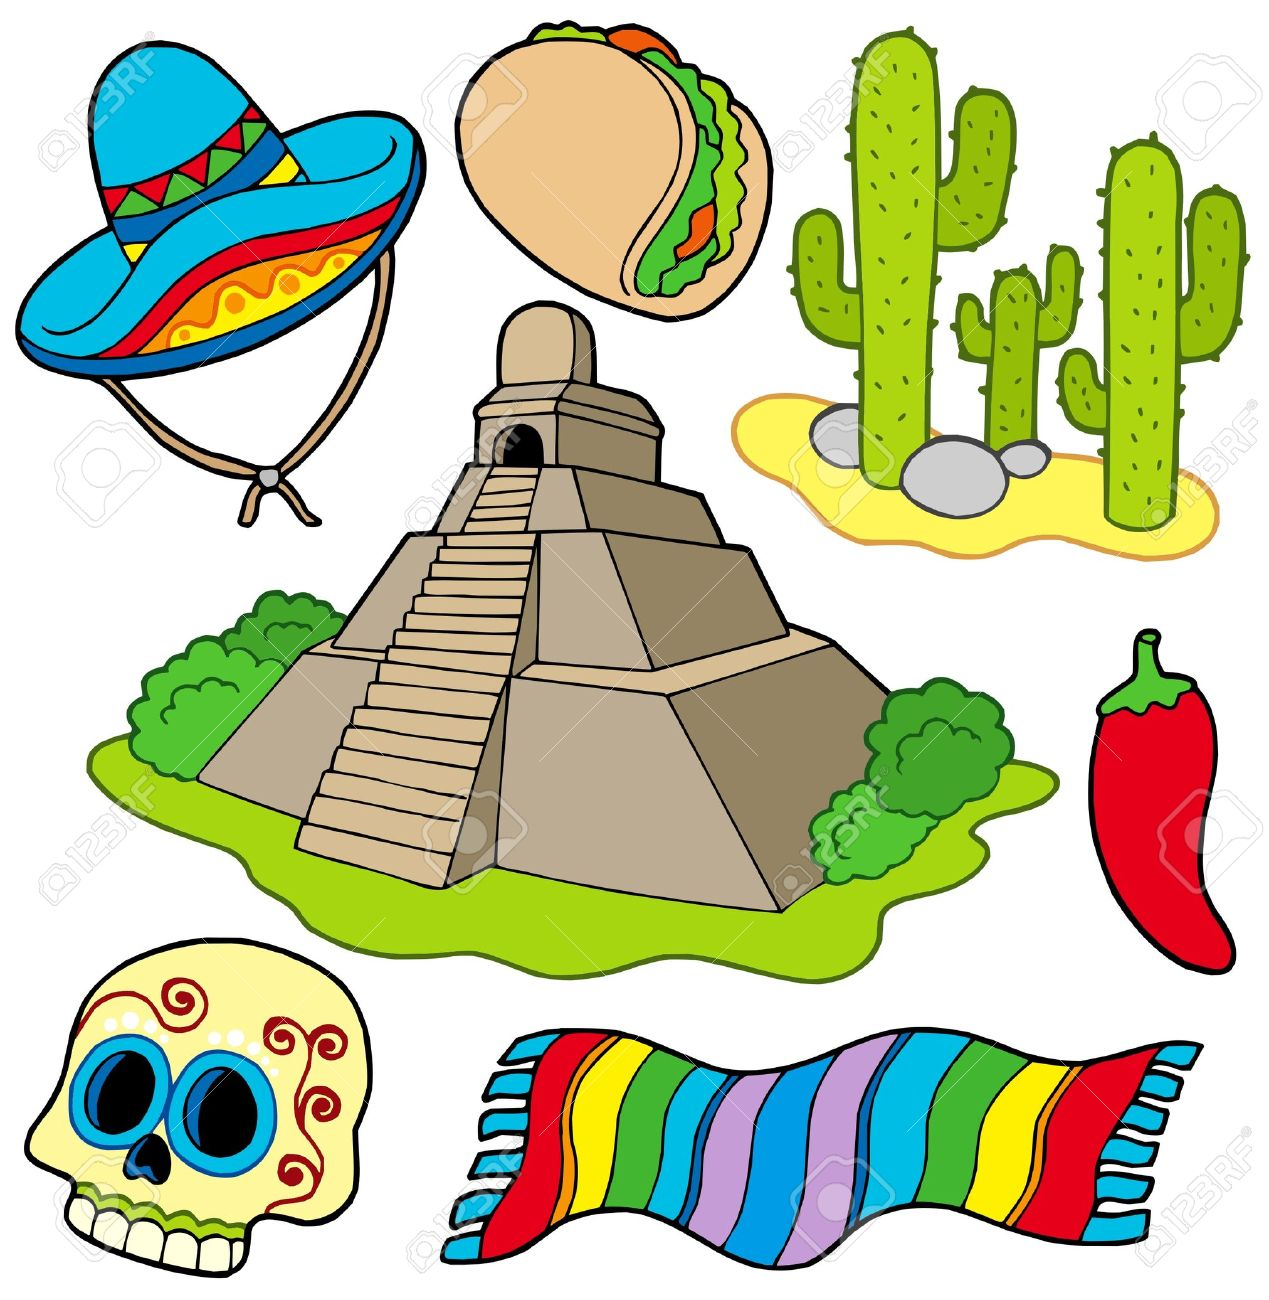 clipart download Mexico clipart. Free cliparts download clip